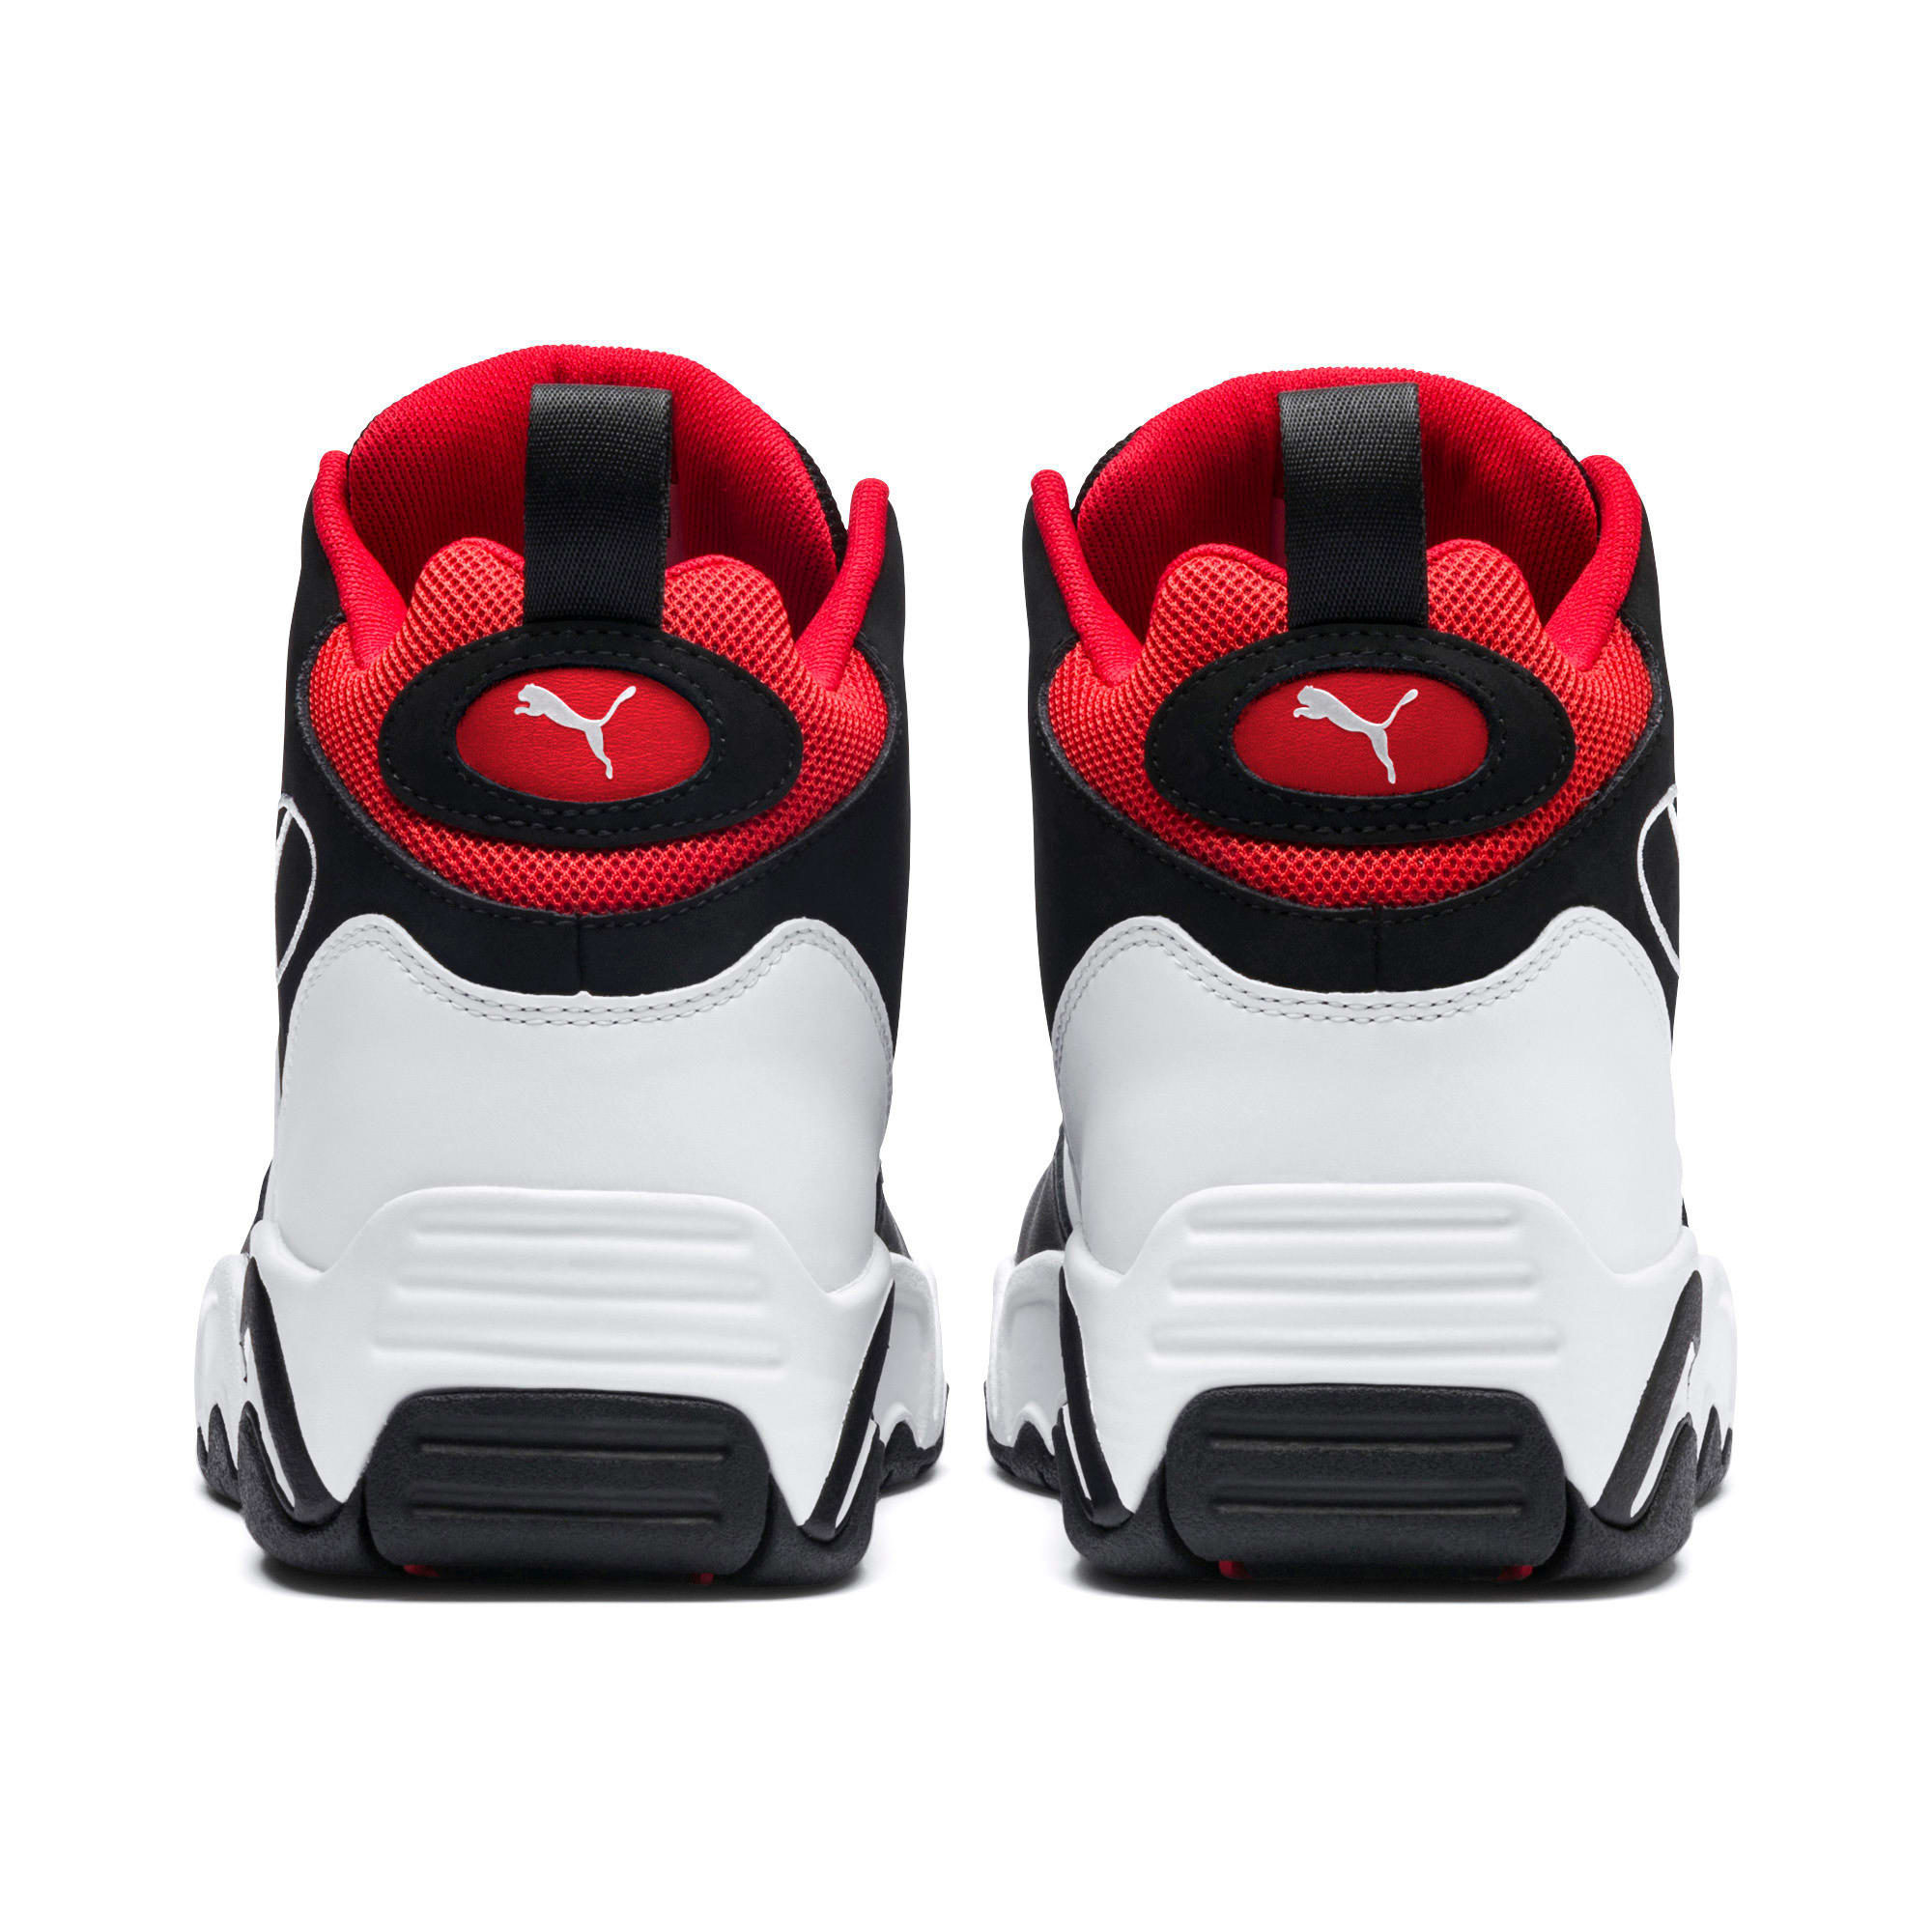 Miniatura 3 de Zapatos deportivos Source de caña media, Black- White-High Risk Red, mediano